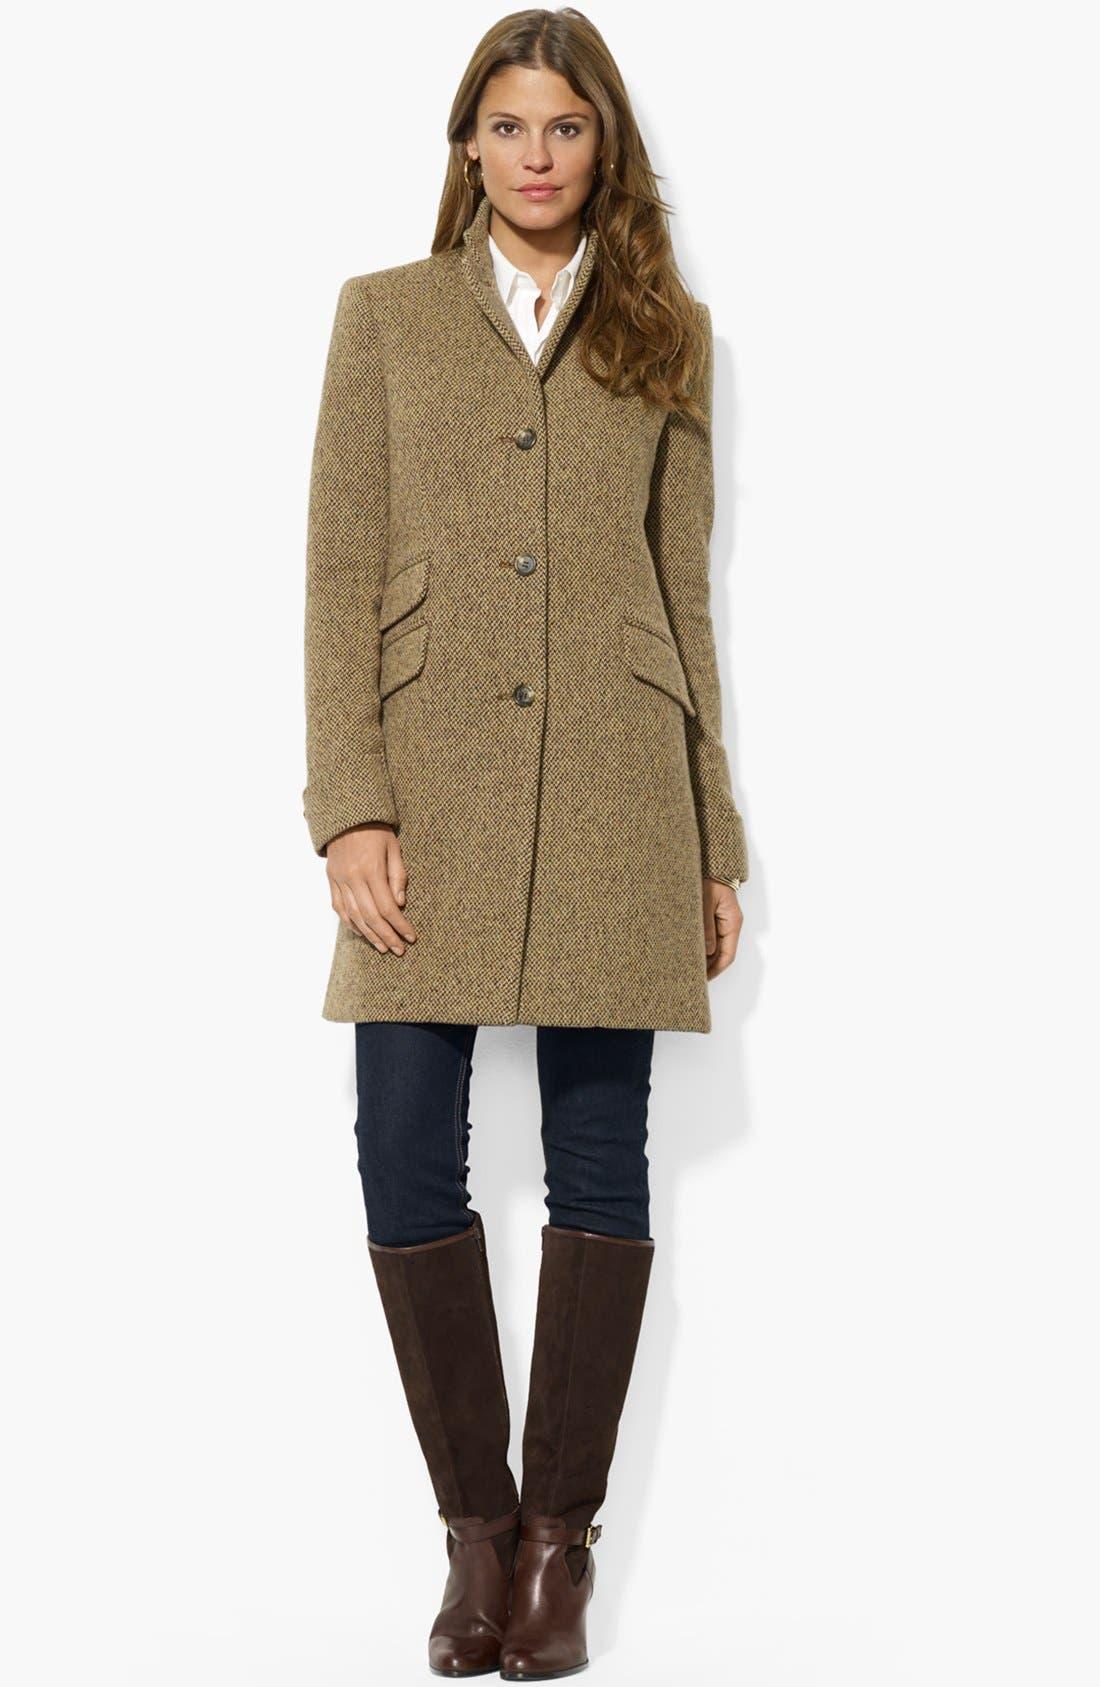 Alternate Image 1 Selected - Lauren Ralph Lauren Wool Blend Twill Coat (Regular & Petite)